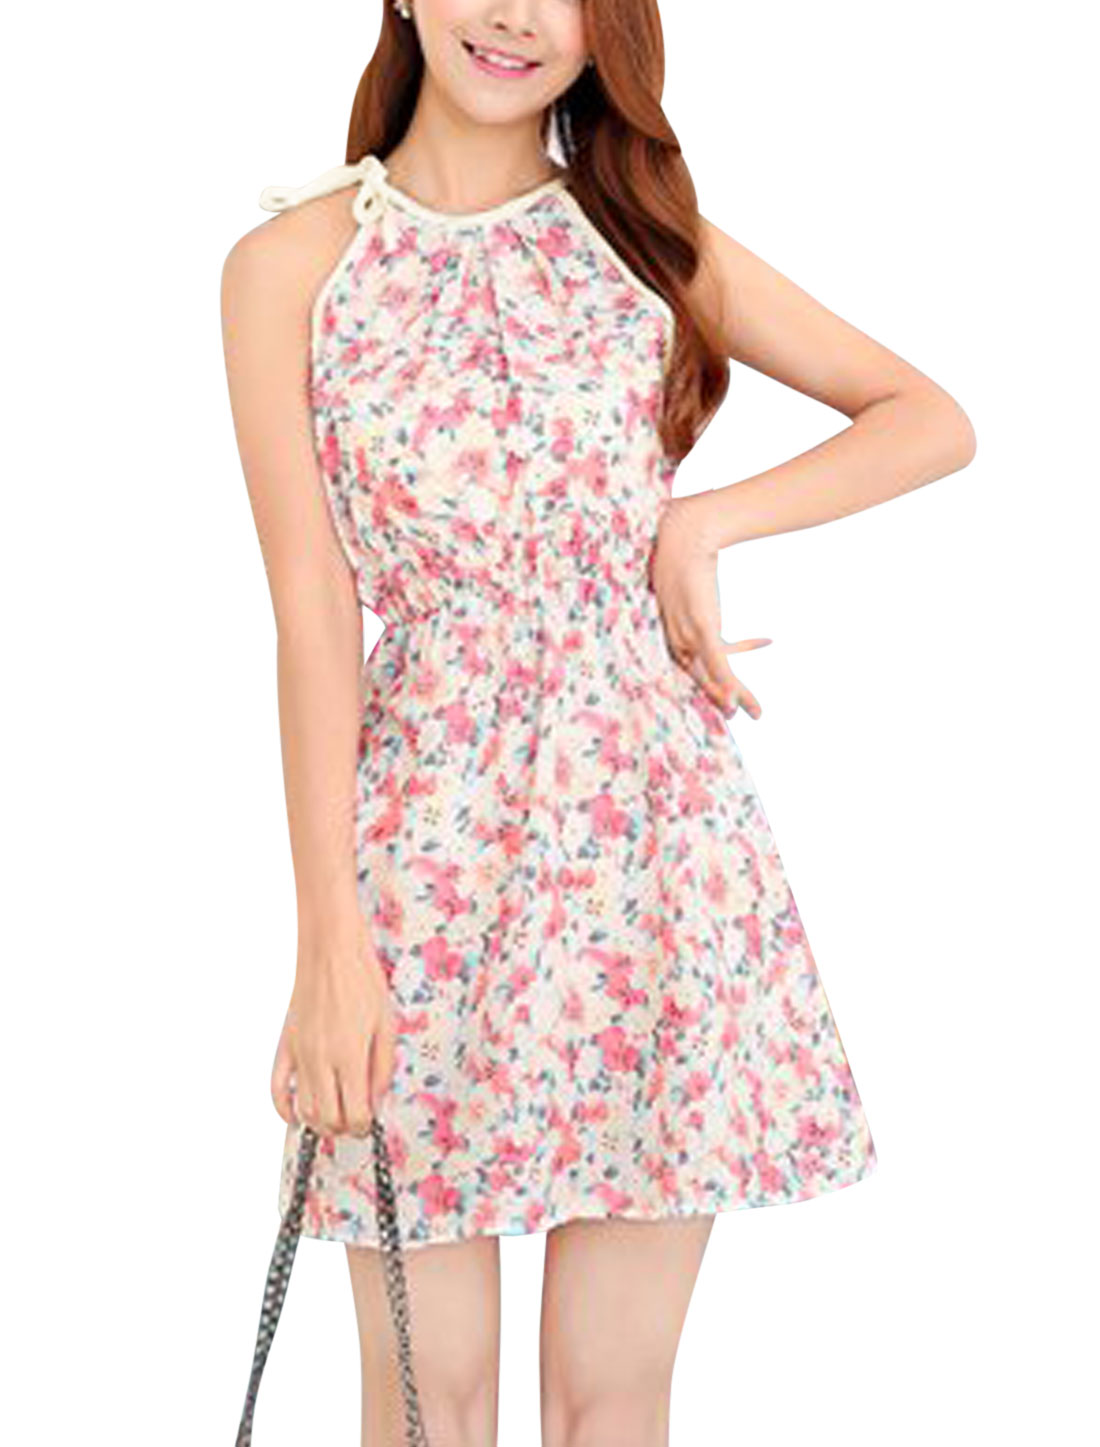 Women Cut Out Back Halter Neck Hearts Print Summer Dresses Beige Fuchsia XS